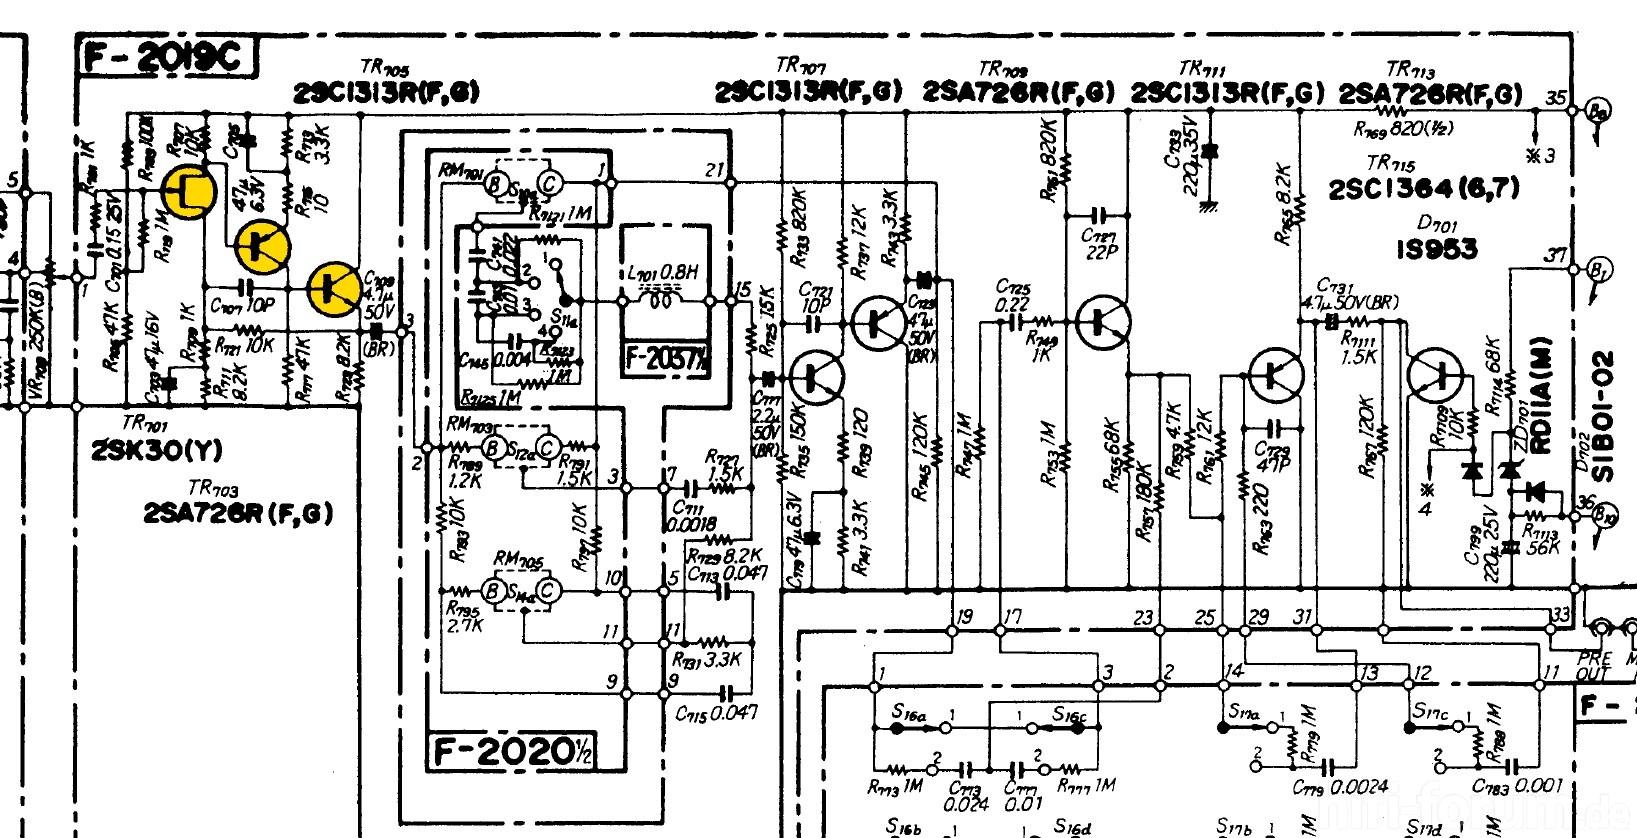 200 Lincoln Ls Fuse Box Diagram Wiring Diagrams 04 Navigator Town Car Auto